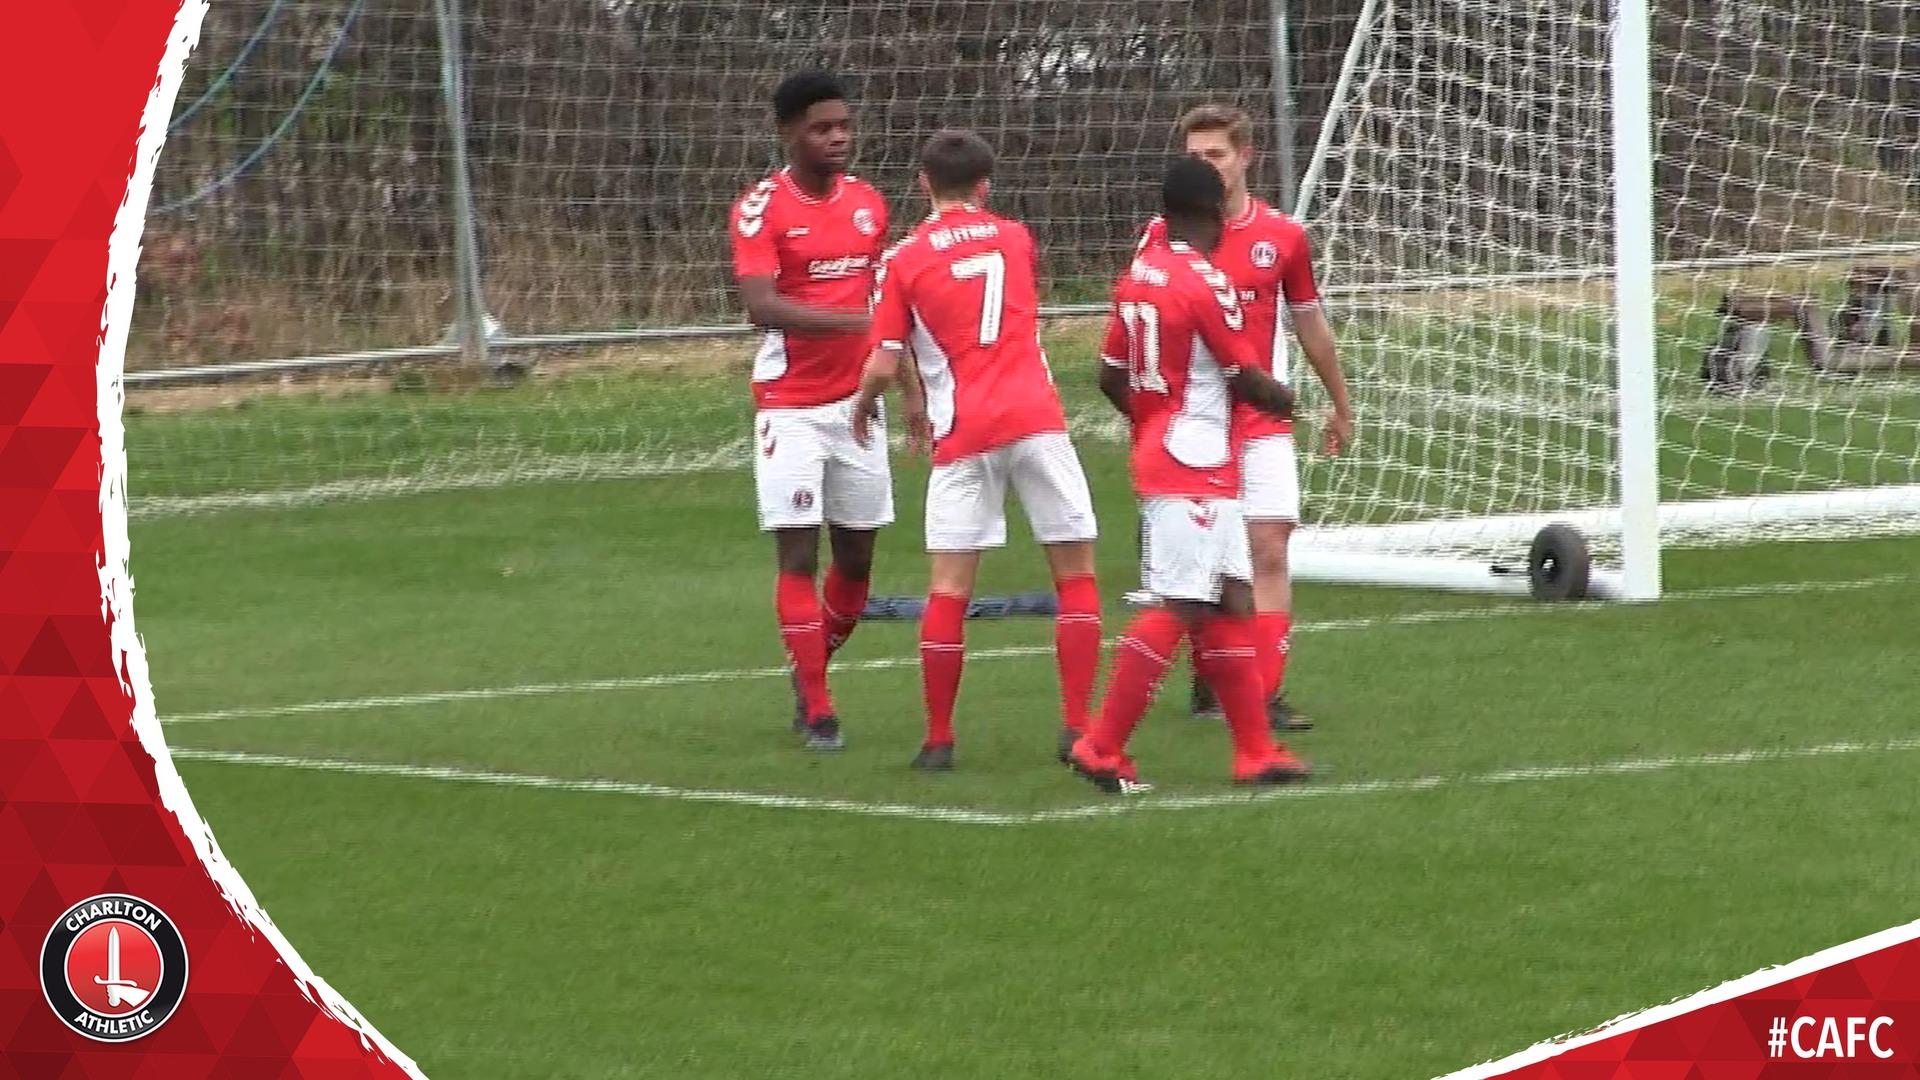 U18S HIGHLIGHTS | Charlton 6 Coventry City 0